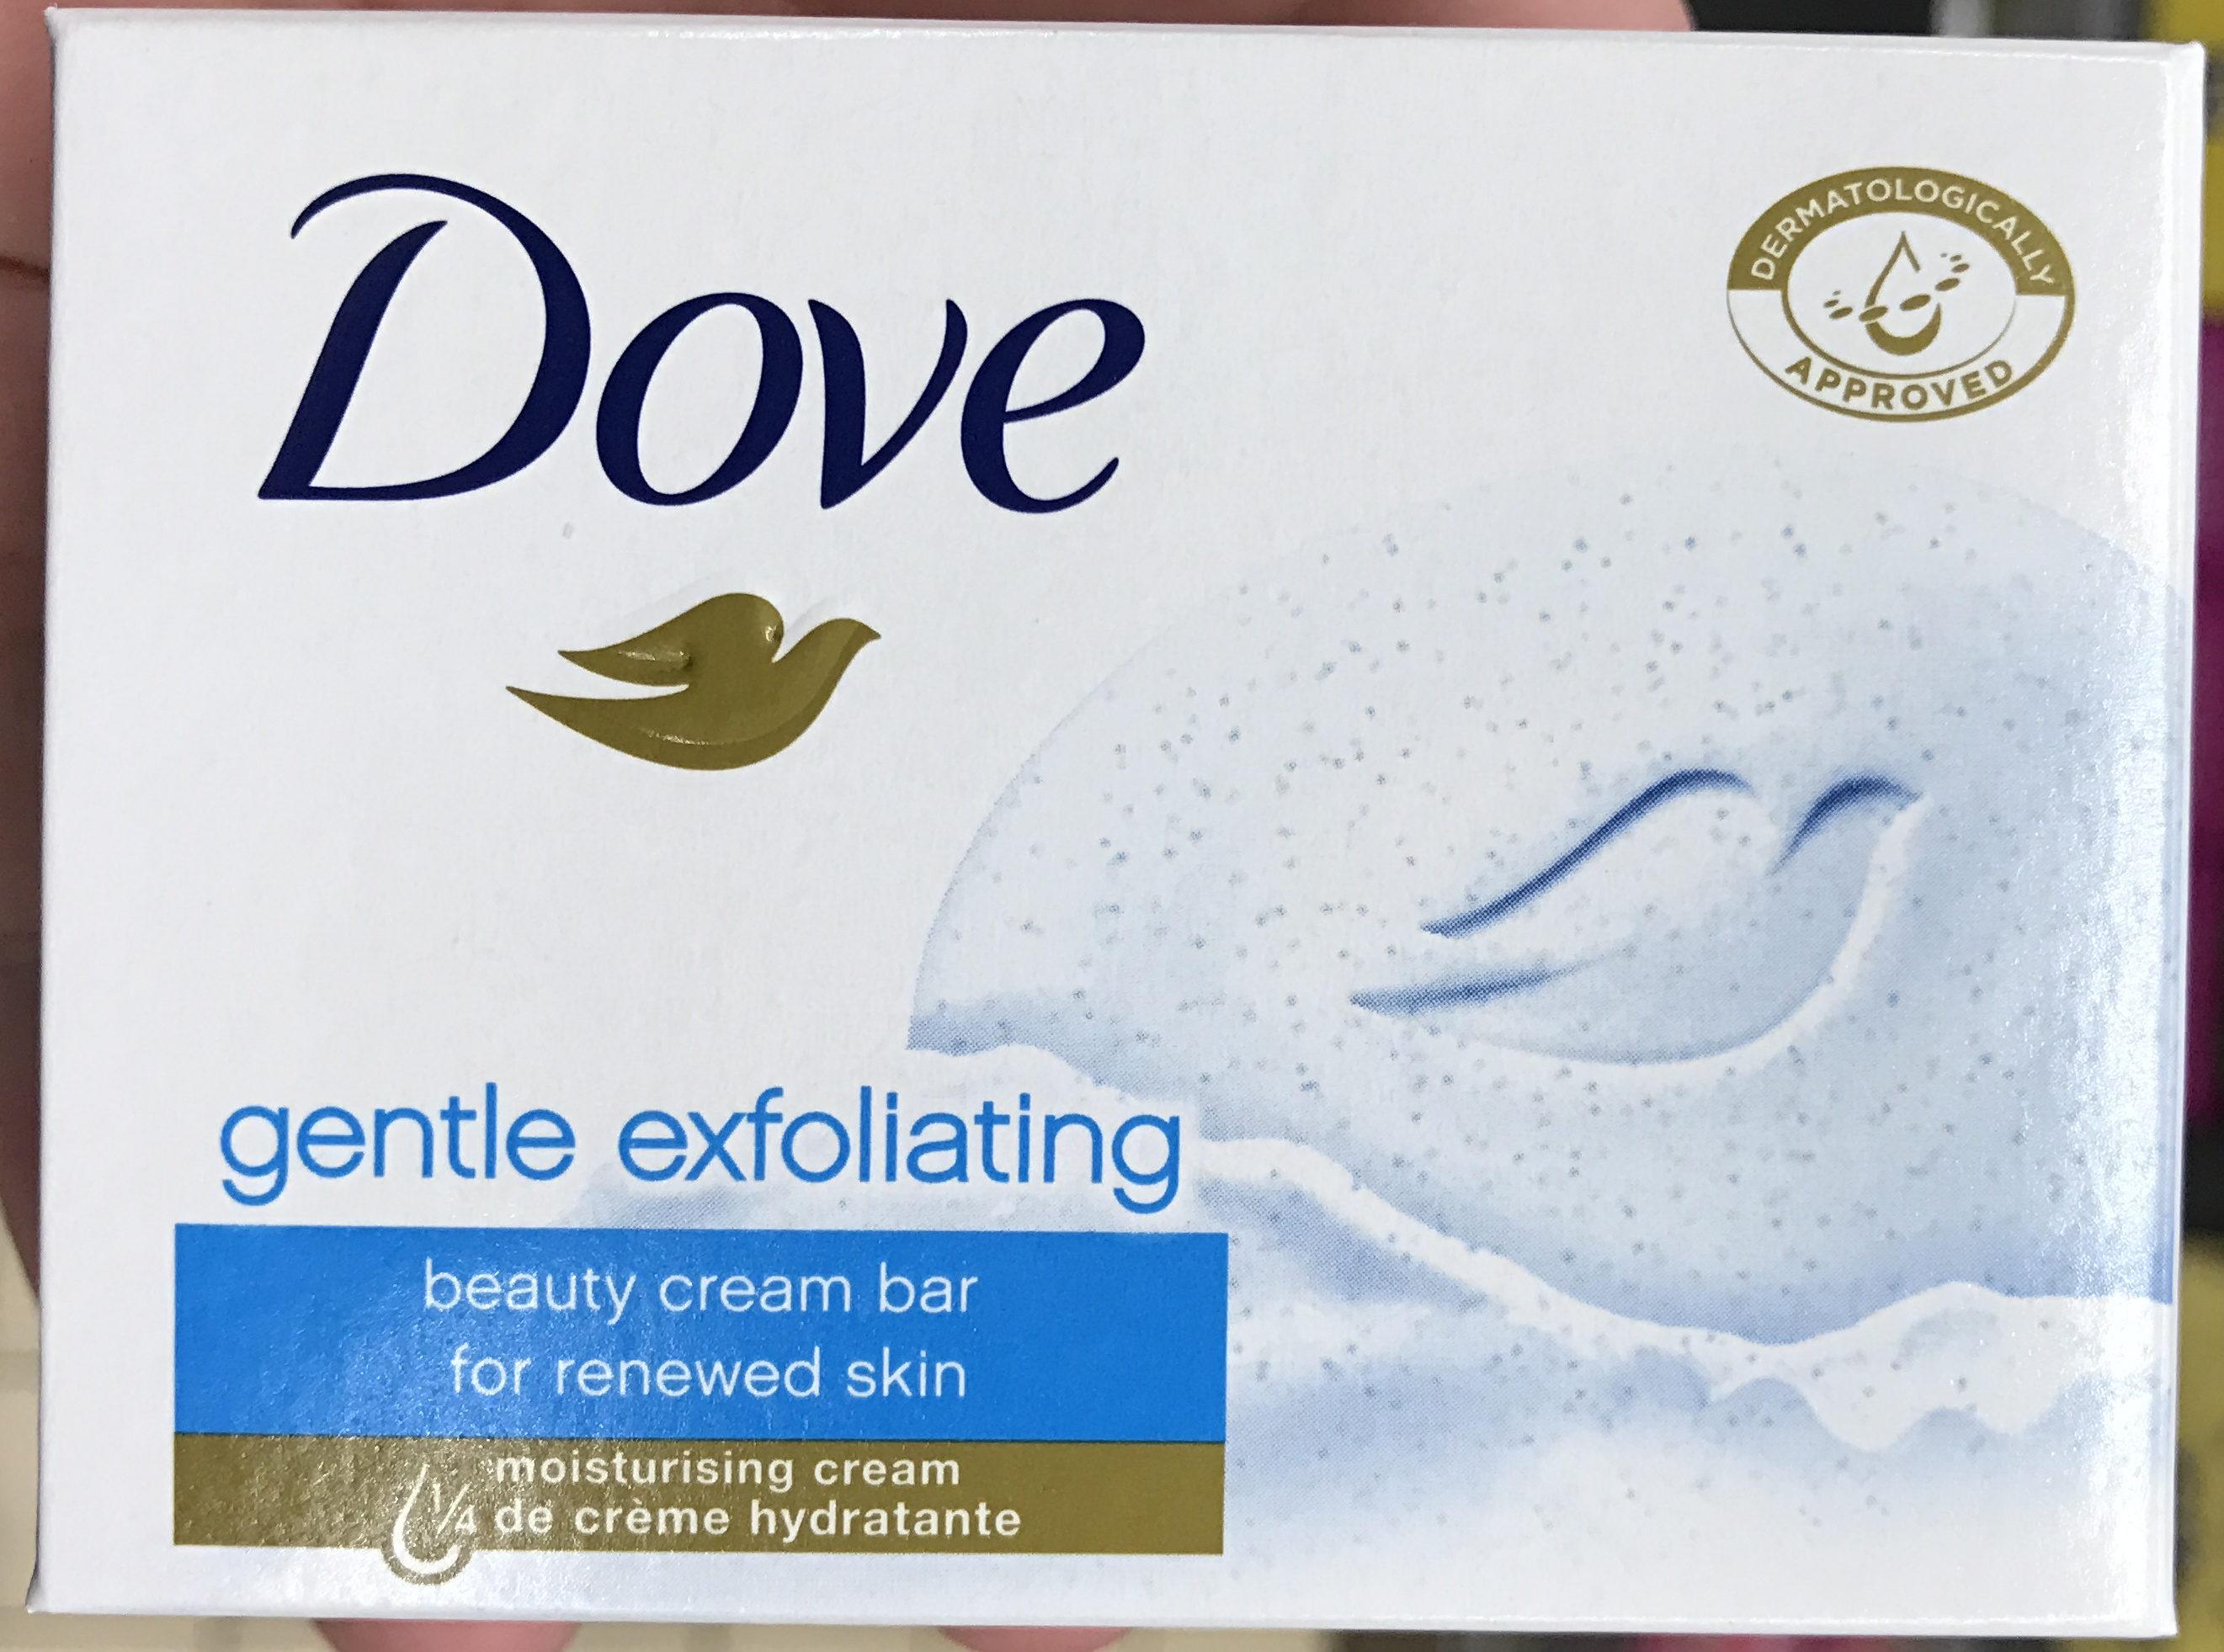 Gentle Exfoliating Beauty Cream Bar - Product